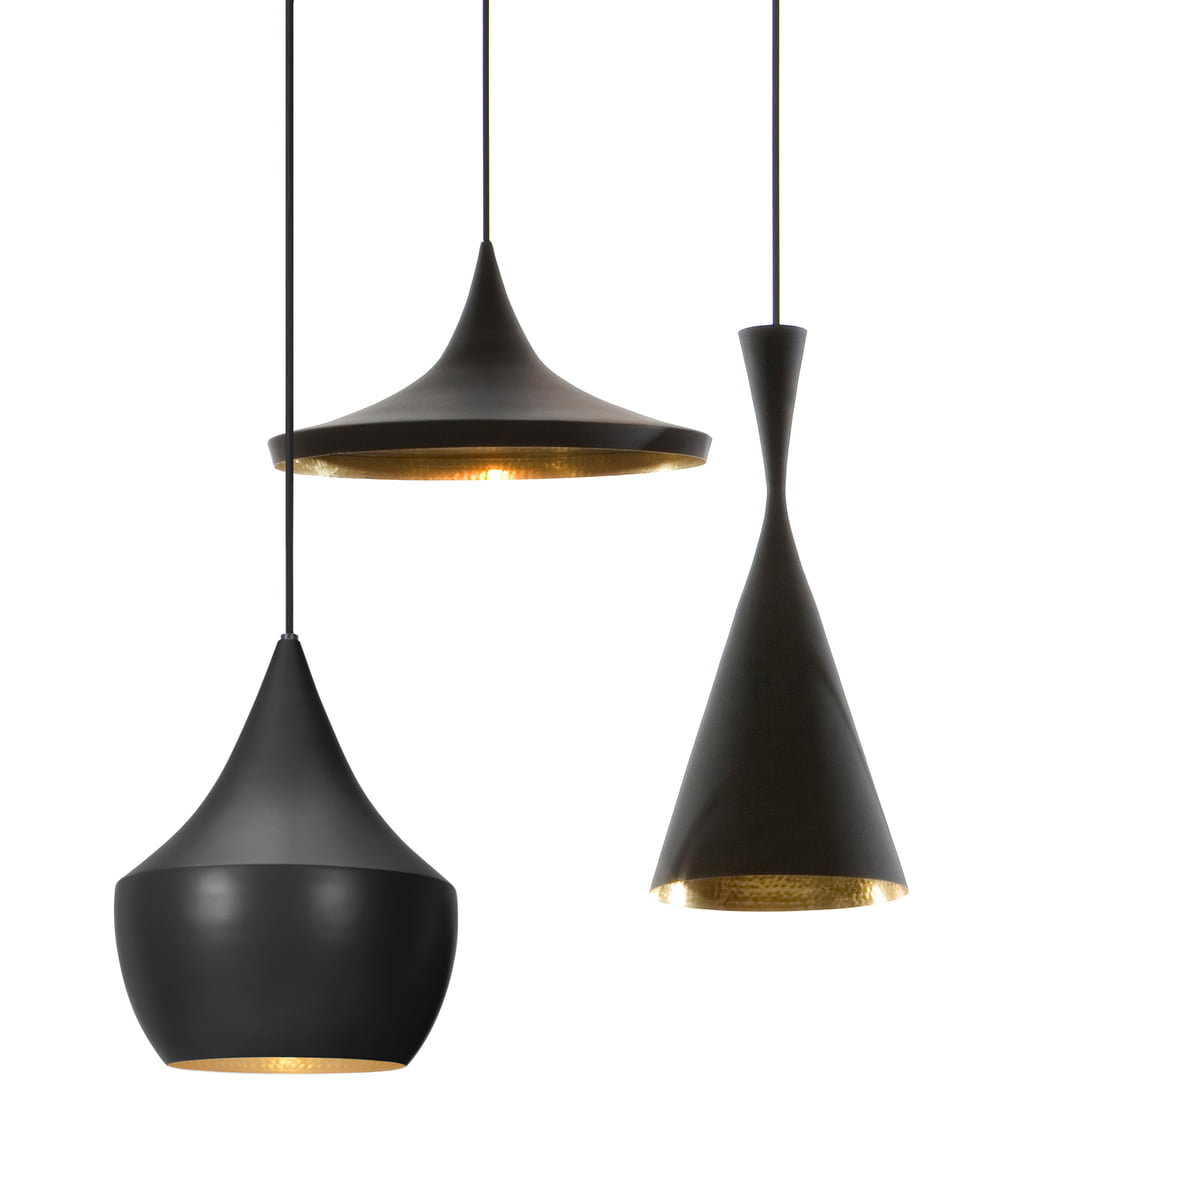 beat light pendelleuchten von tom dixon. Black Bedroom Furniture Sets. Home Design Ideas